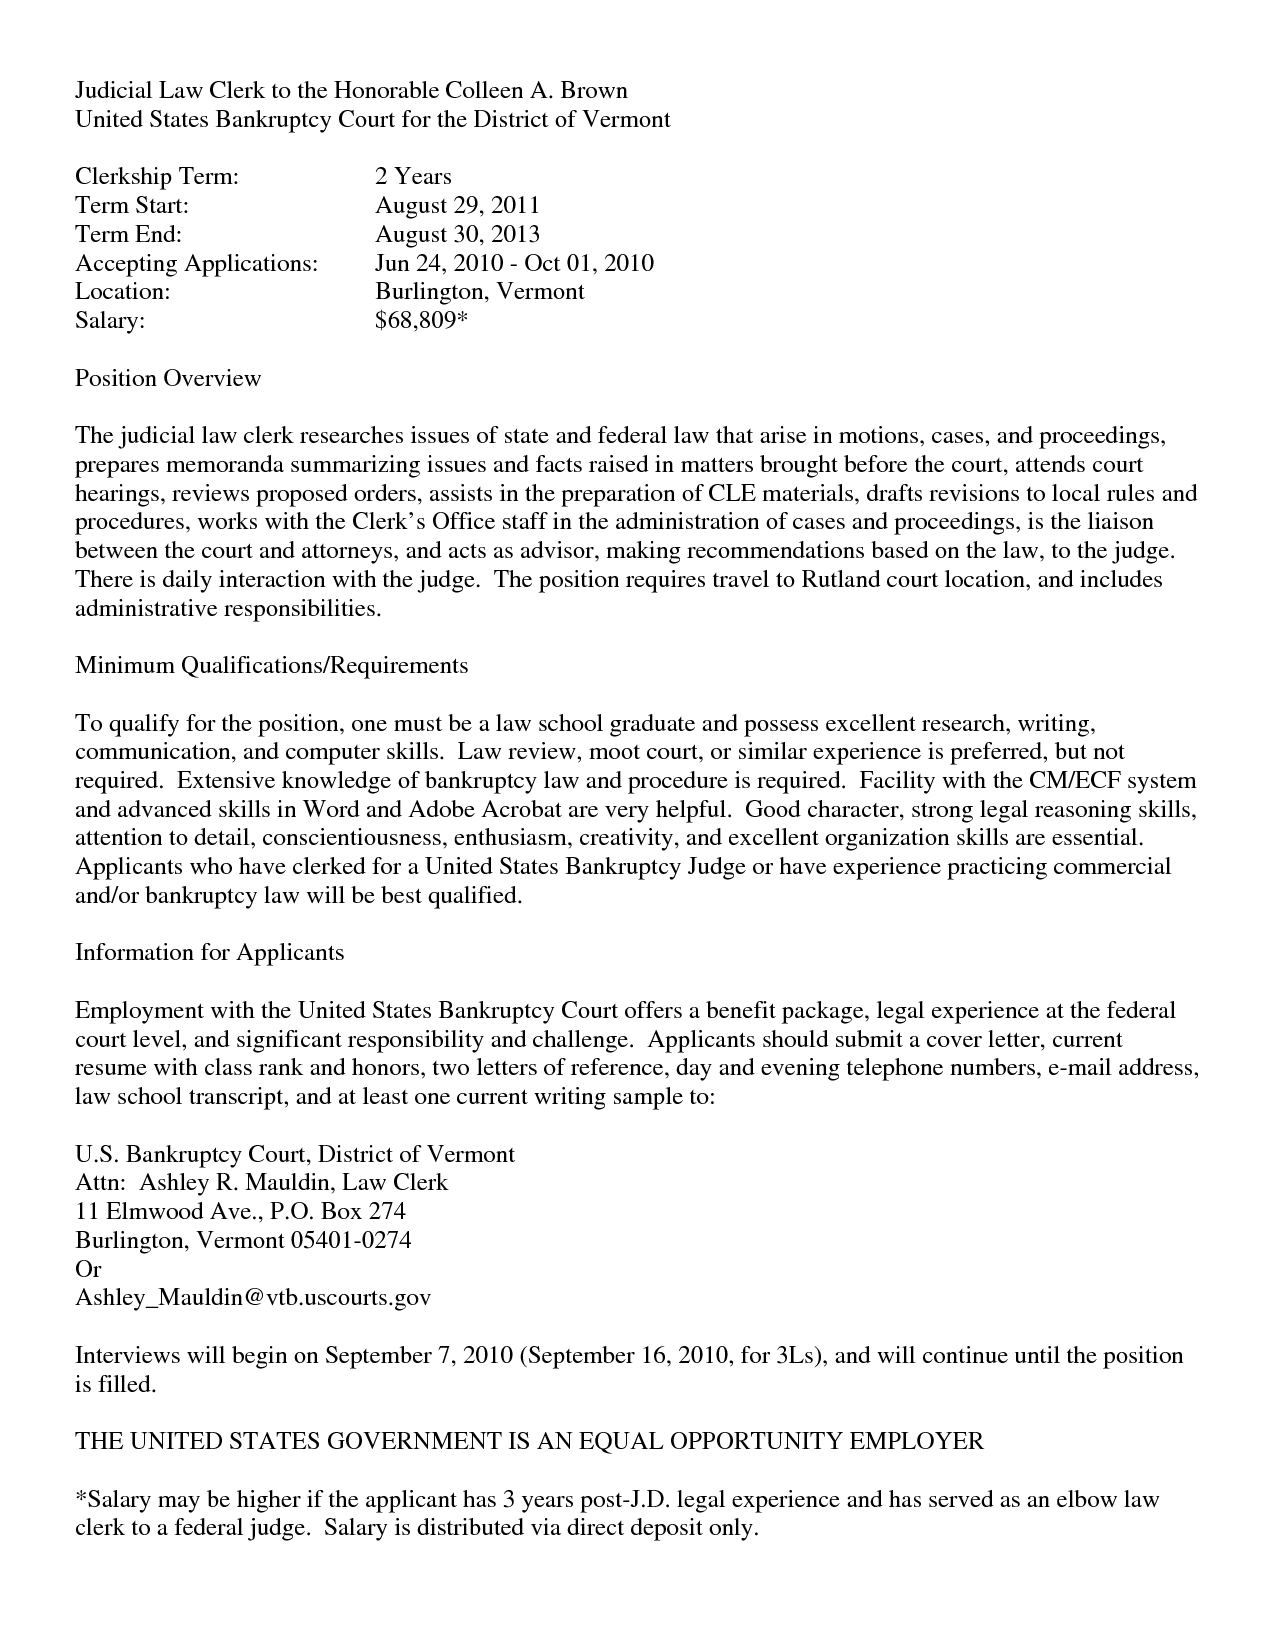 Recommendation Letter Sample For Job Applicationreference Letter Examples Business Letter Reference Letter Business Letter Example Job Application Cover Letter